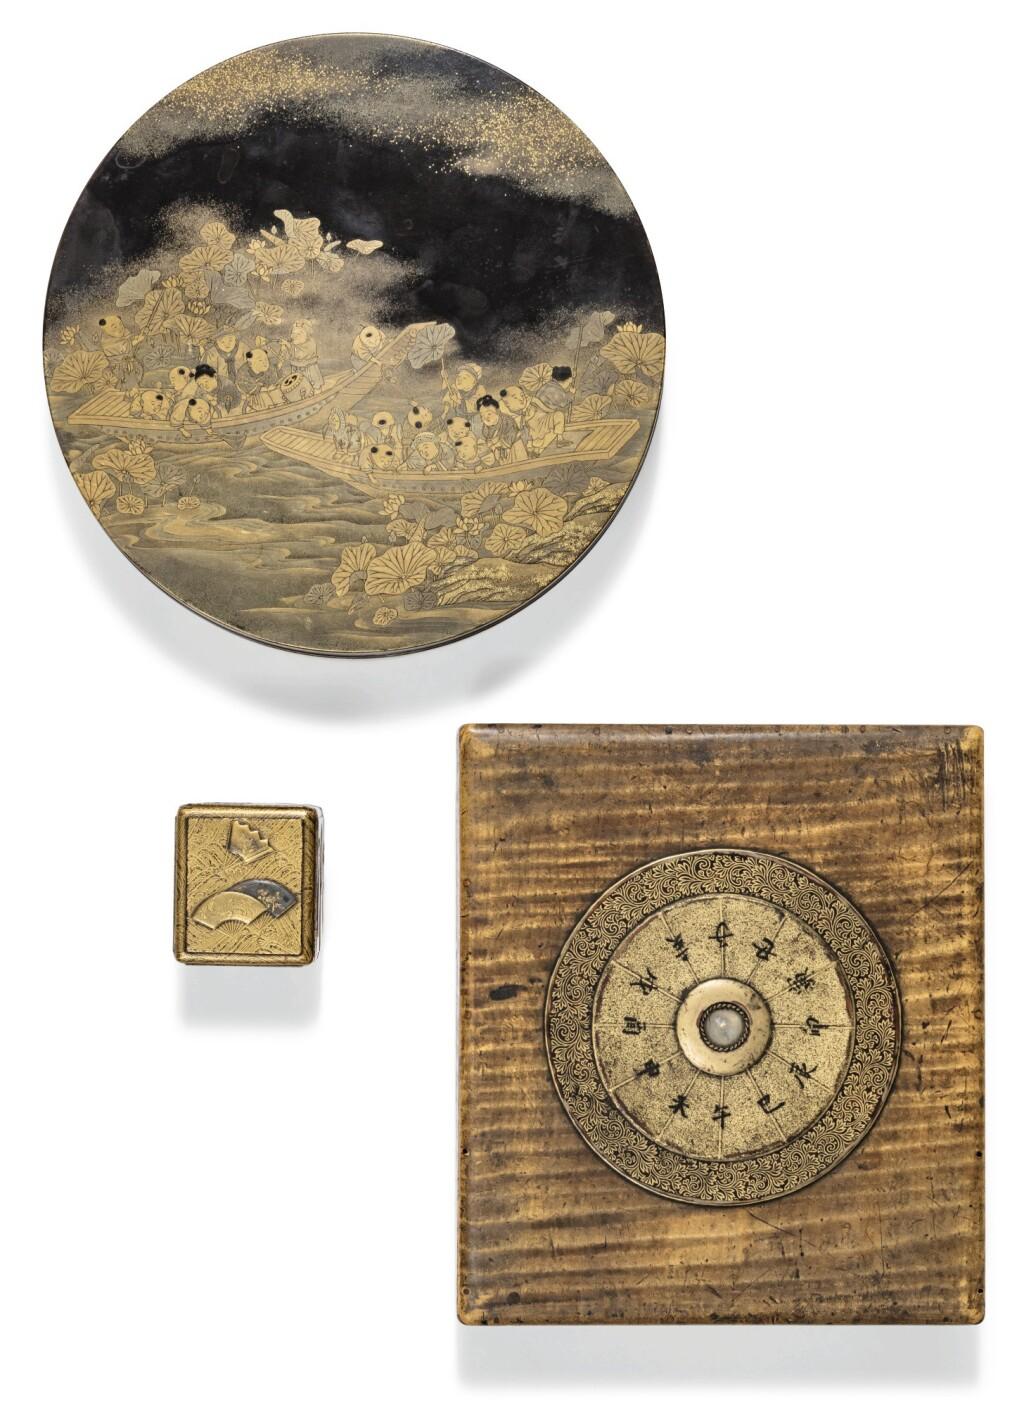 DEUX SUZURIBAKO EN LAQUE JAPON, ÉPOQUE EDO/MEIJI | Two lacquer suzuribako, Japan, Edo/Meiji period